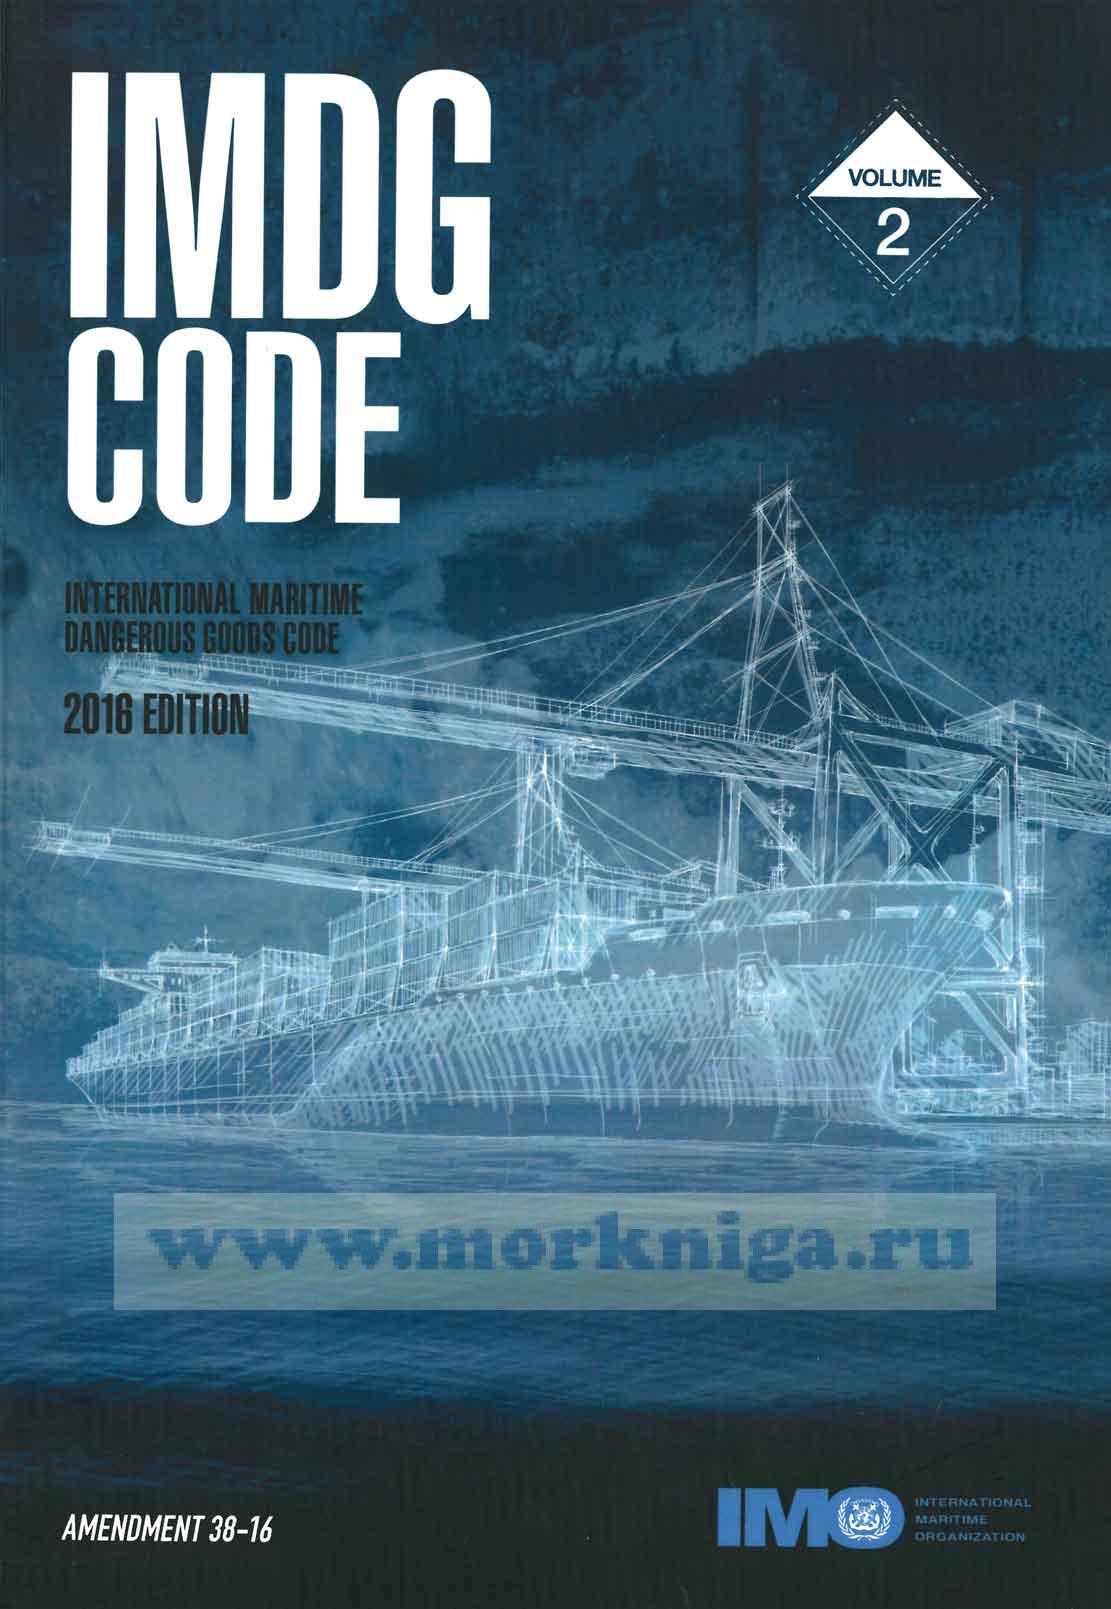 IMDG Code. International Maritime Dangerous Goods Code. 2016 edition. Volume 1 and Volume 2